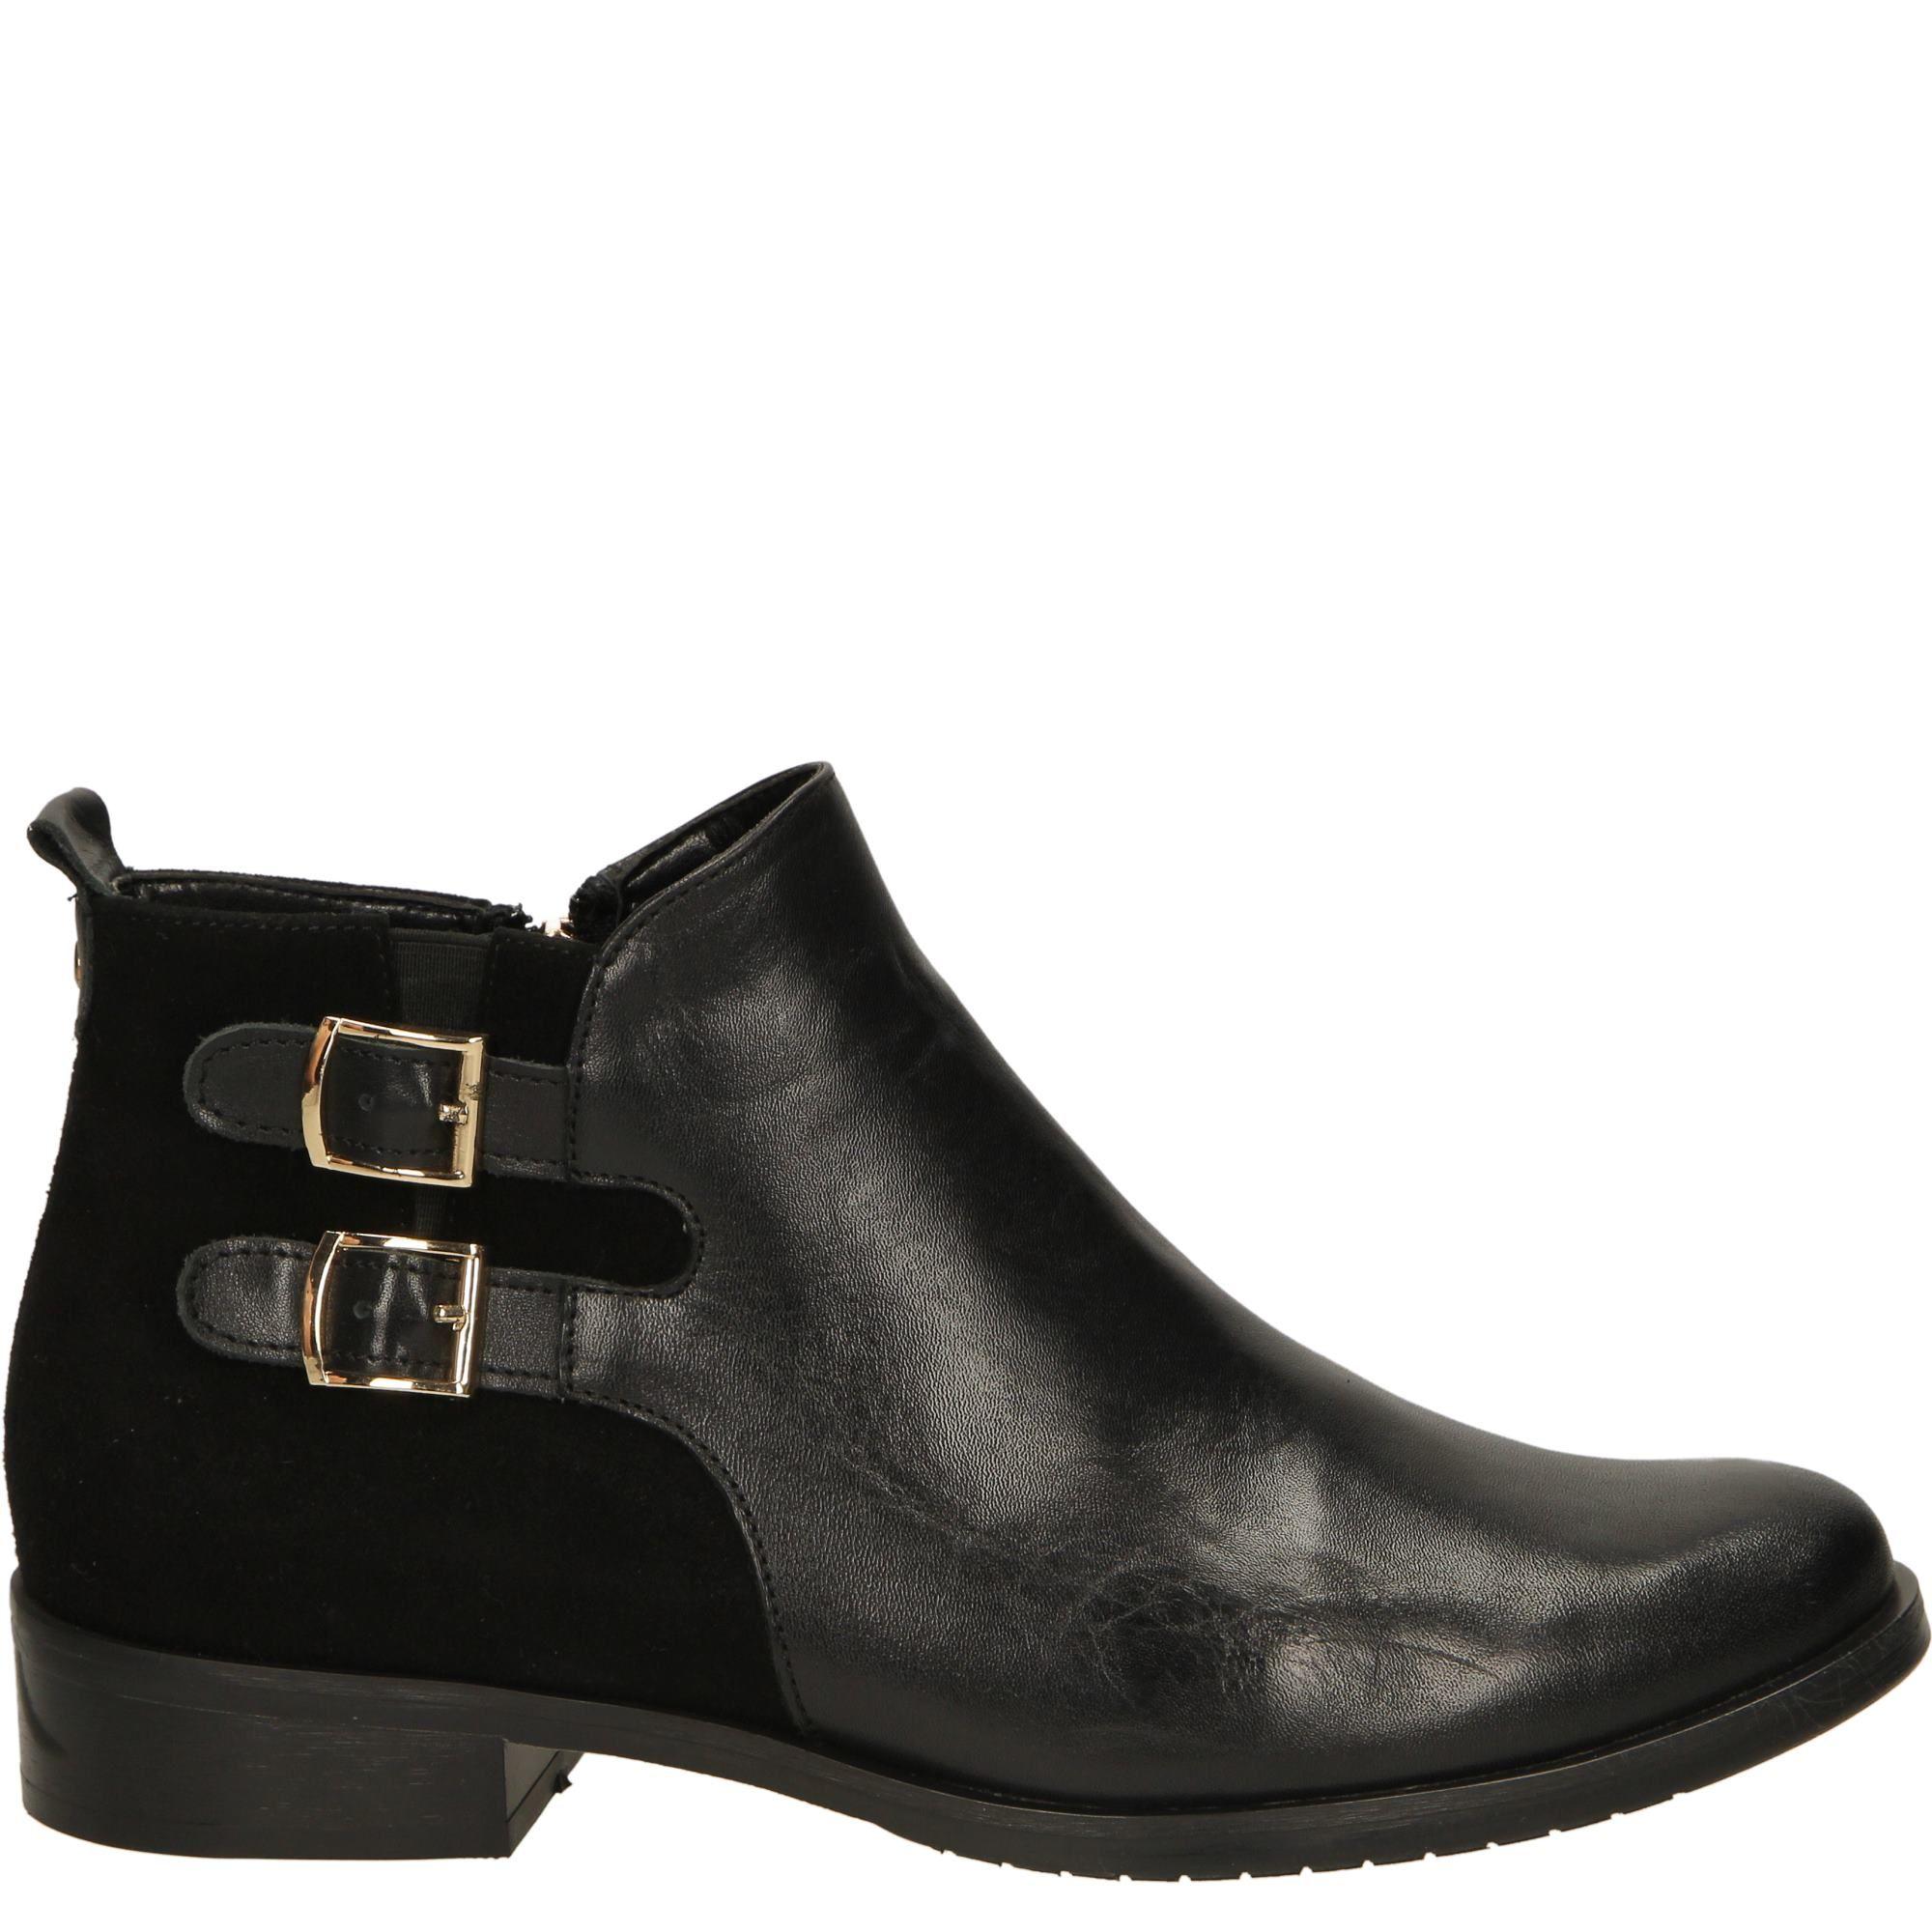 Botki Ocieplane 846 Pe Z Nero Dress Shoes Men Oxford Shoes Boots